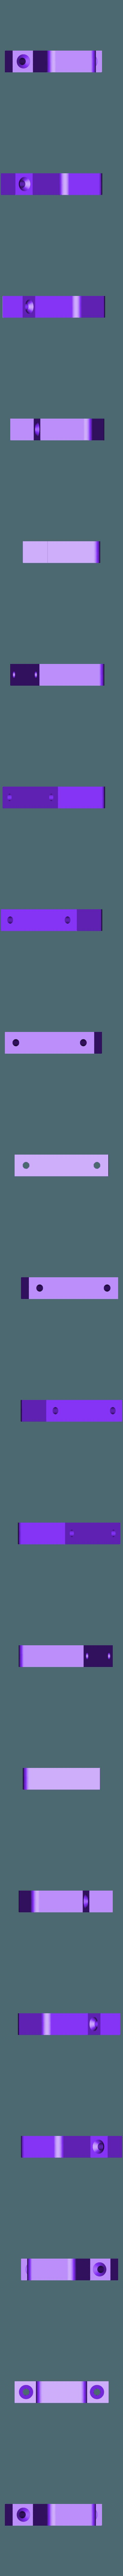 Door04k.stl Download free STL file Cat Flap Automatic Door • 3D printing model, Edd77